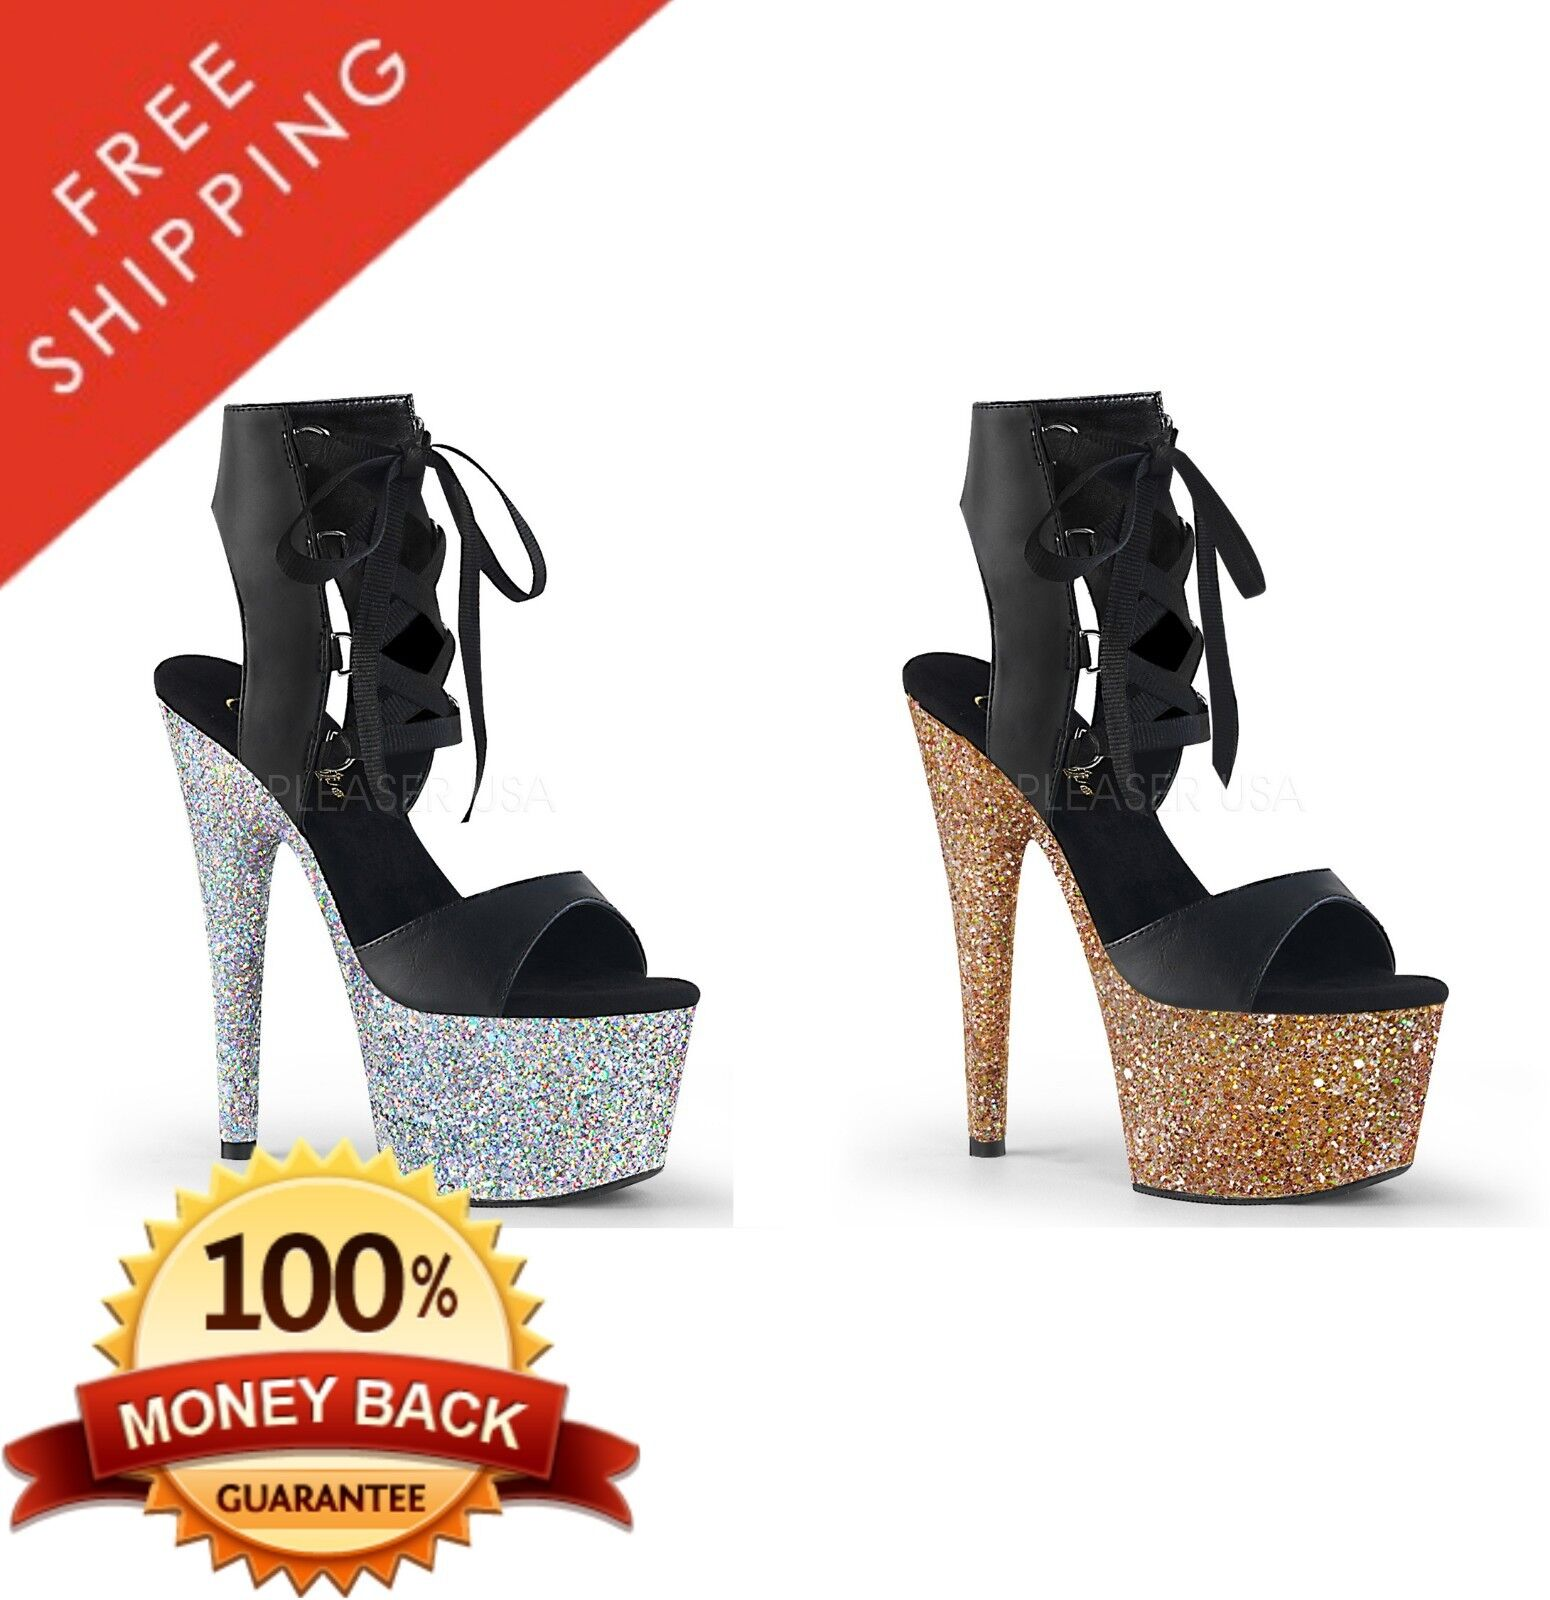 vendita calda Pleaser ADORE-700-14LG Platform Front Lace-up Ankle High High High Sandal 7  Heel  sconto prezzo basso